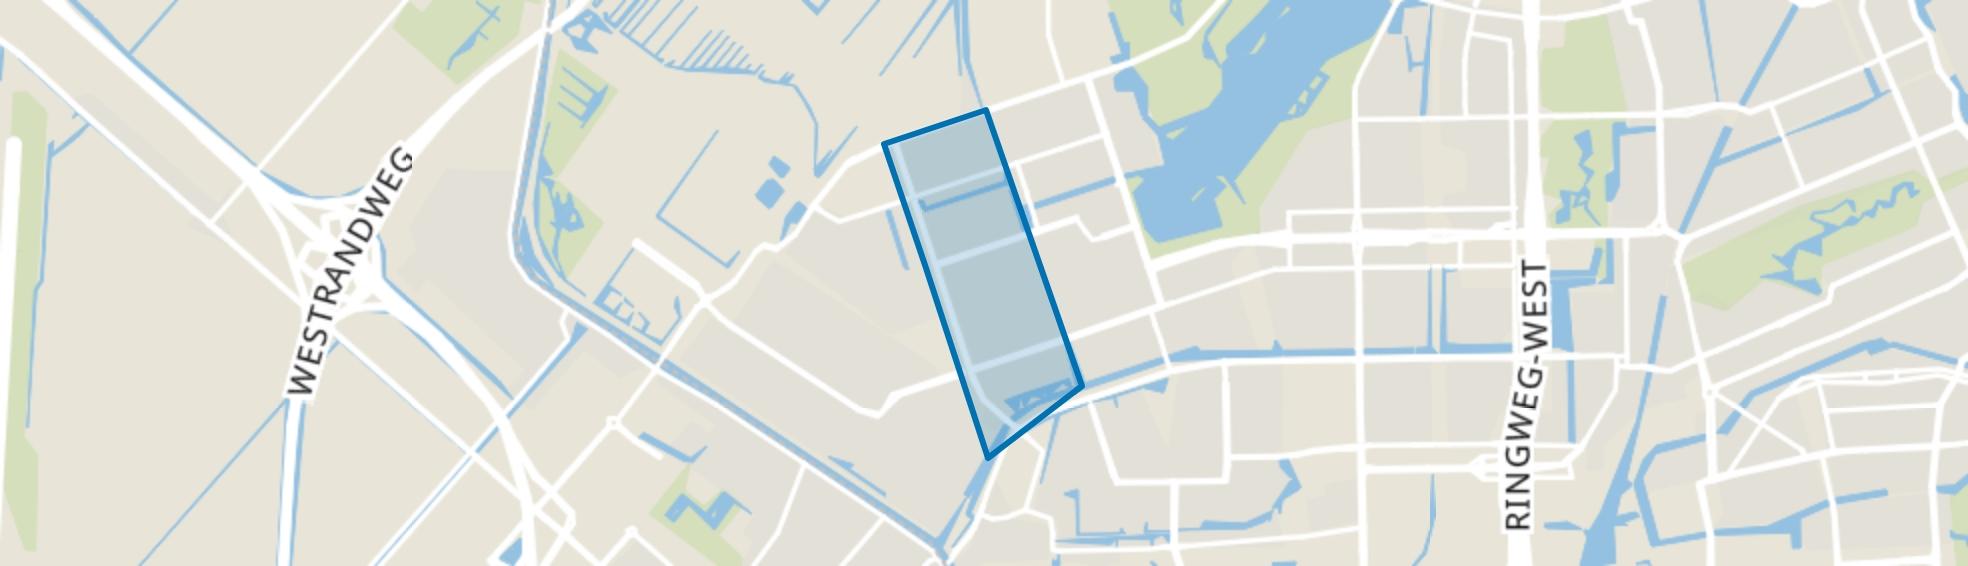 Osdorp-Midden, Amsterdam map